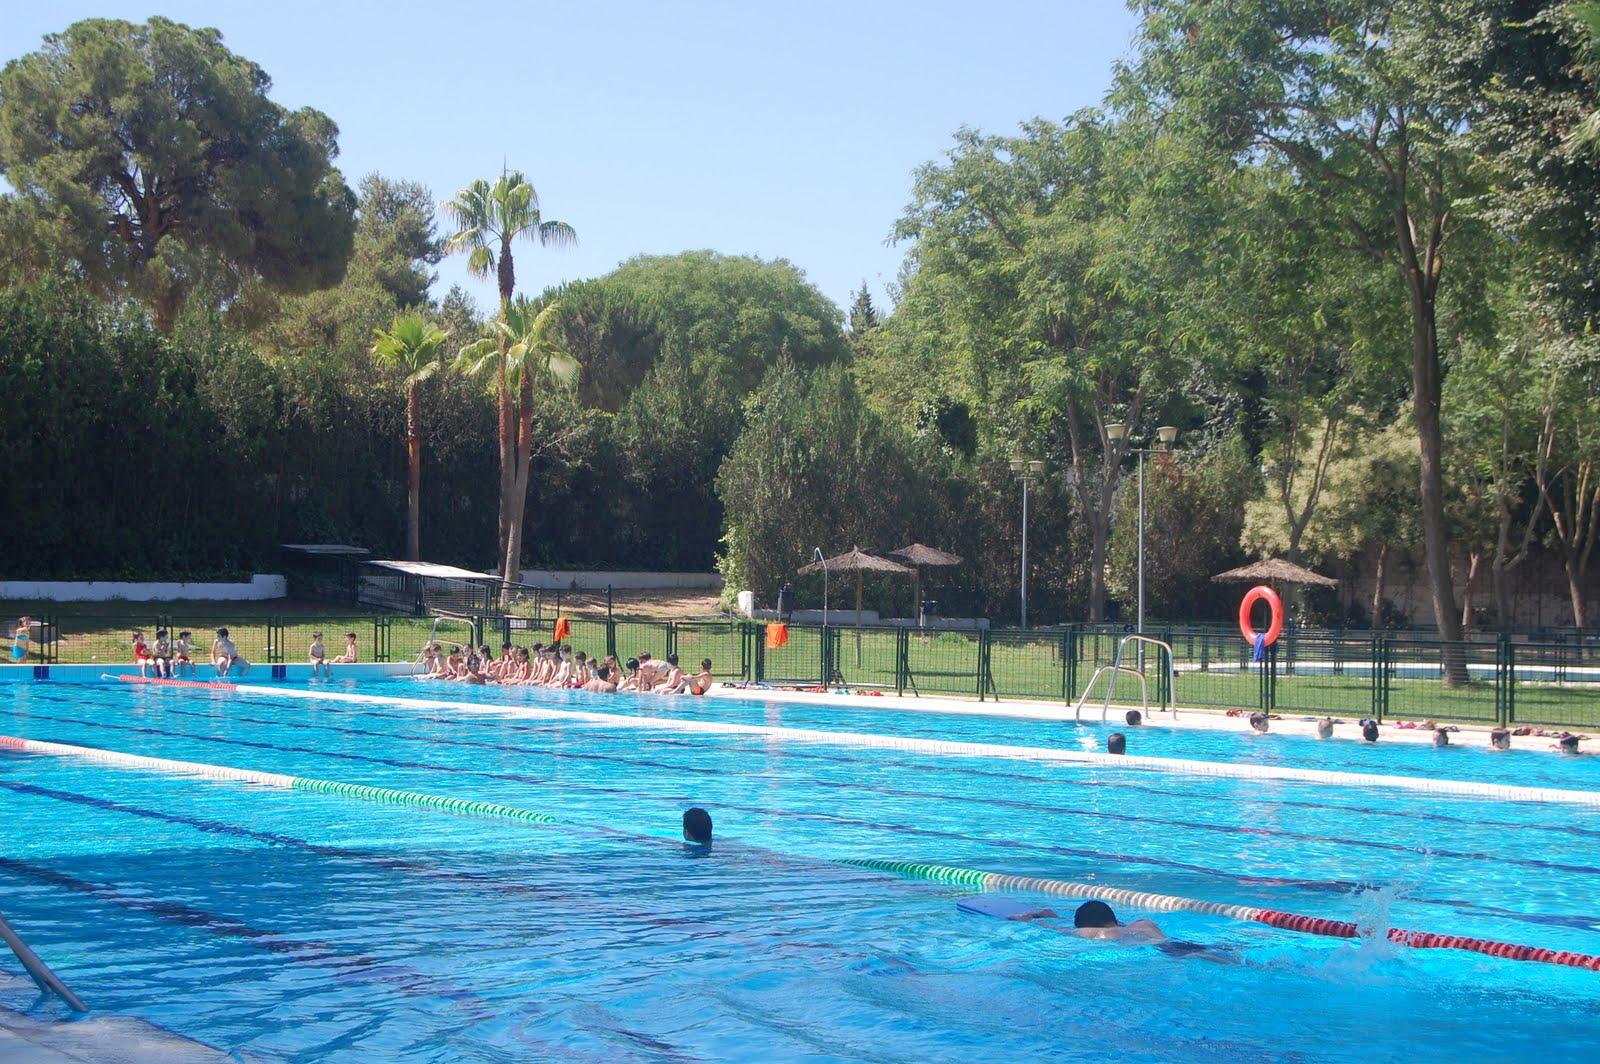 gruposocialistaalcalaguadaira la piscina municipal de san